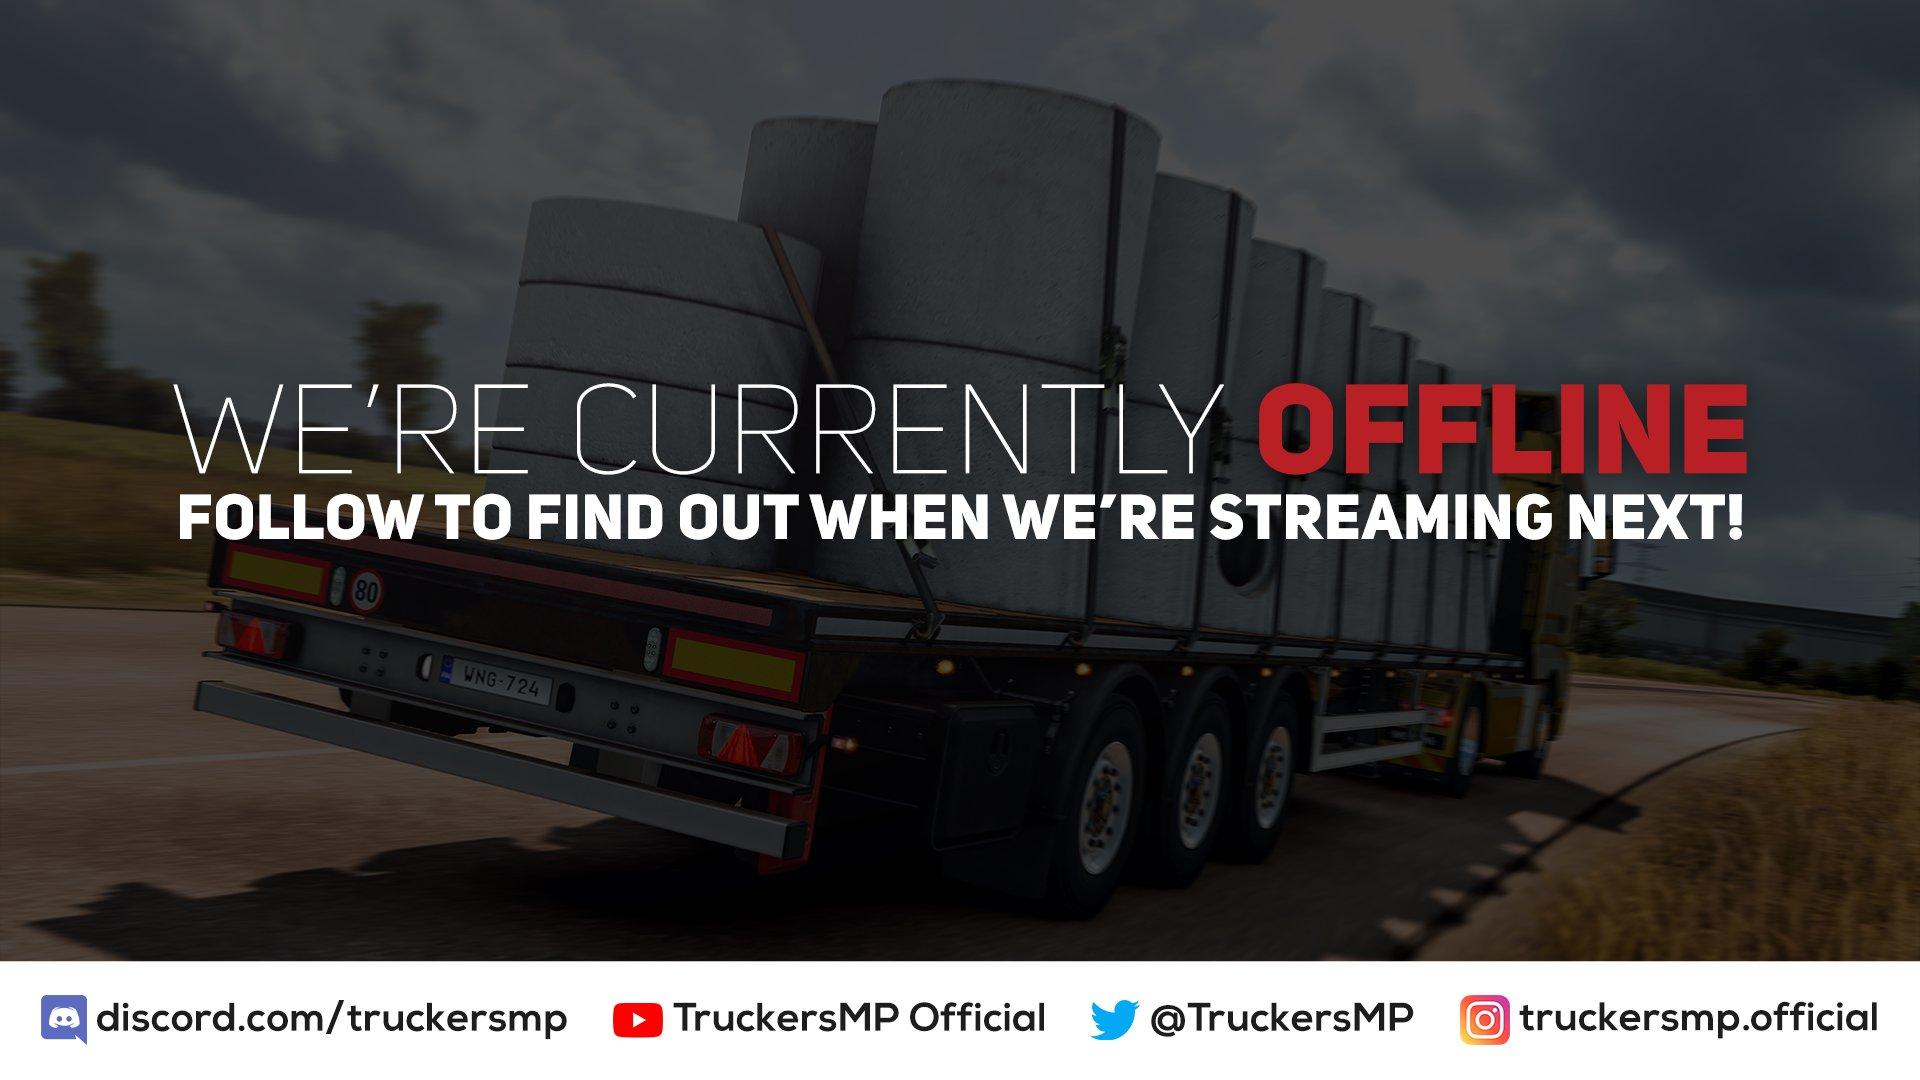 TruckersMP_Official